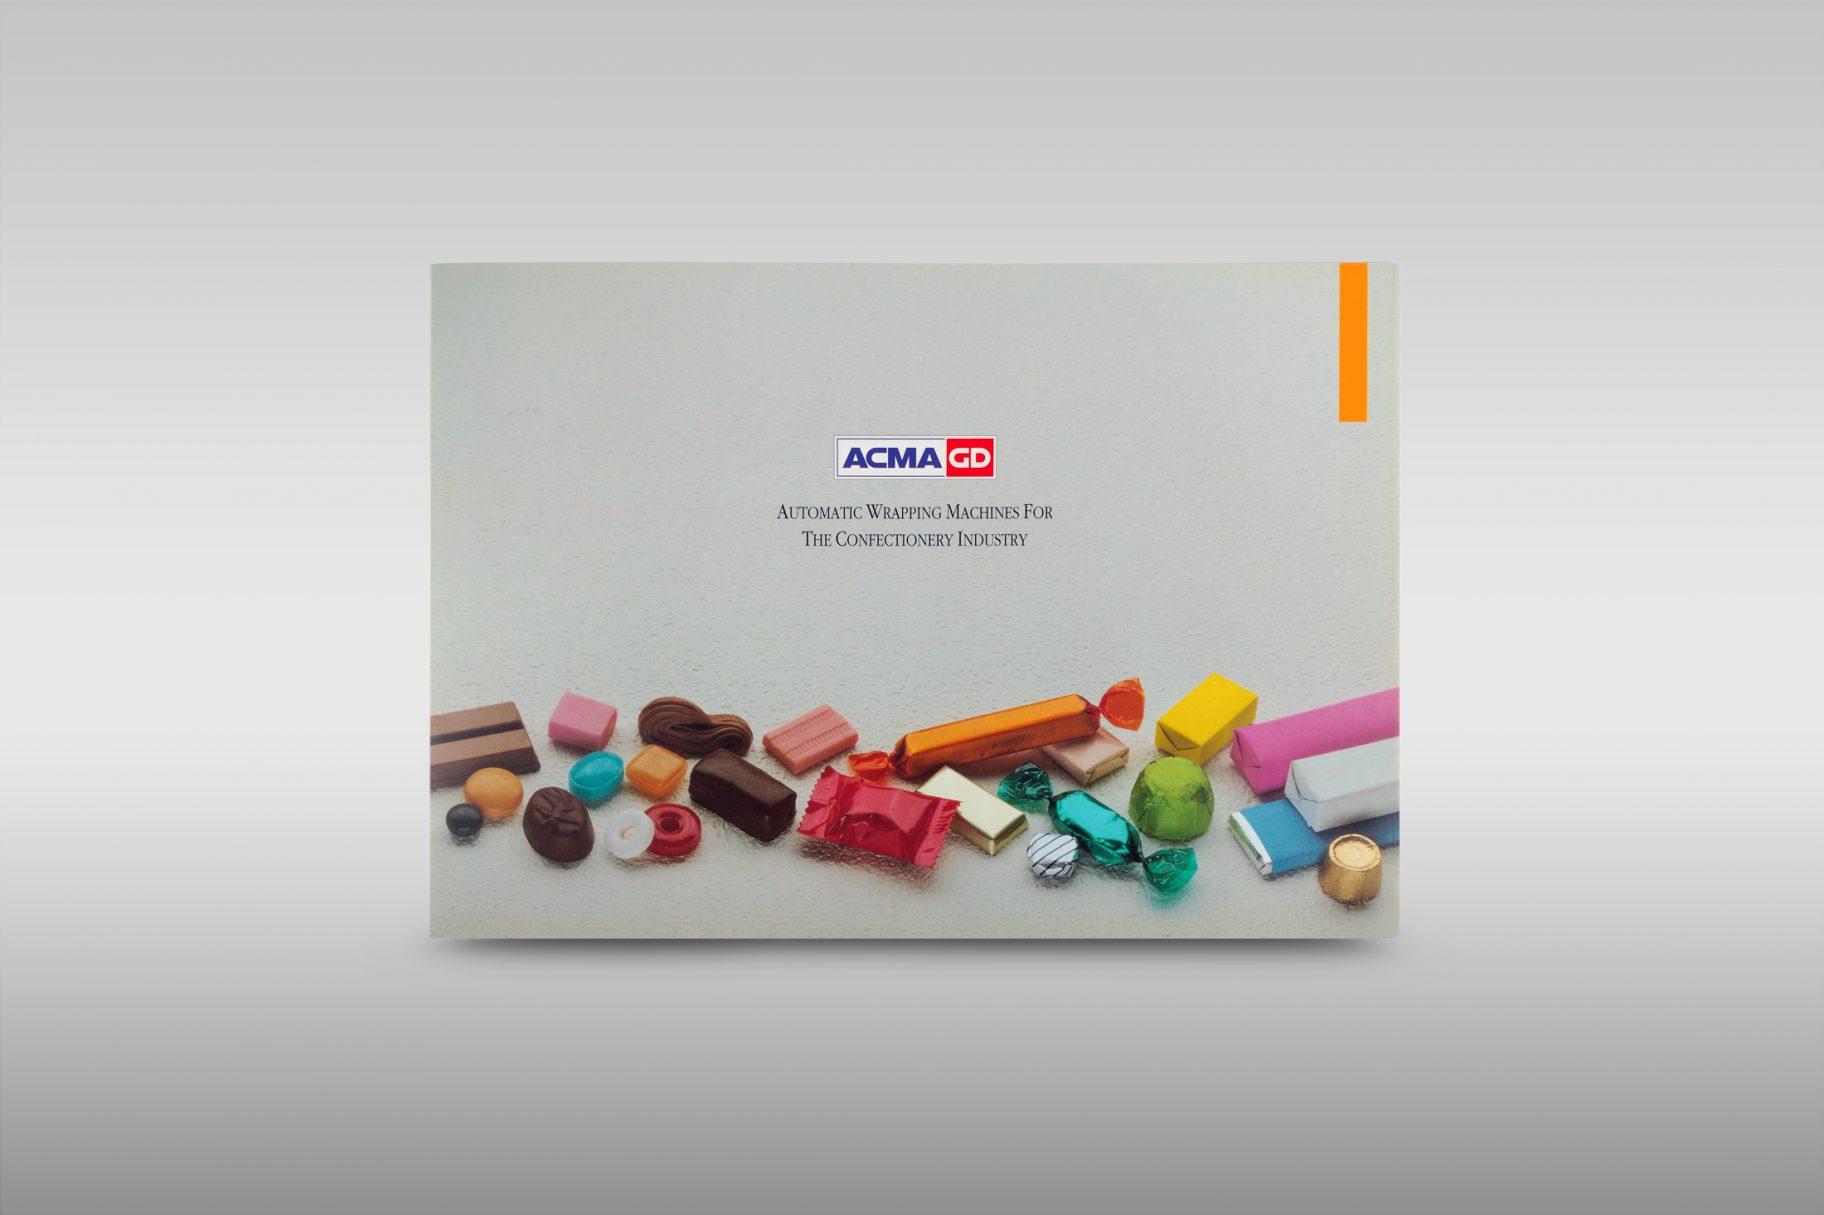 ACMA-GD-caramelle-pieghevole